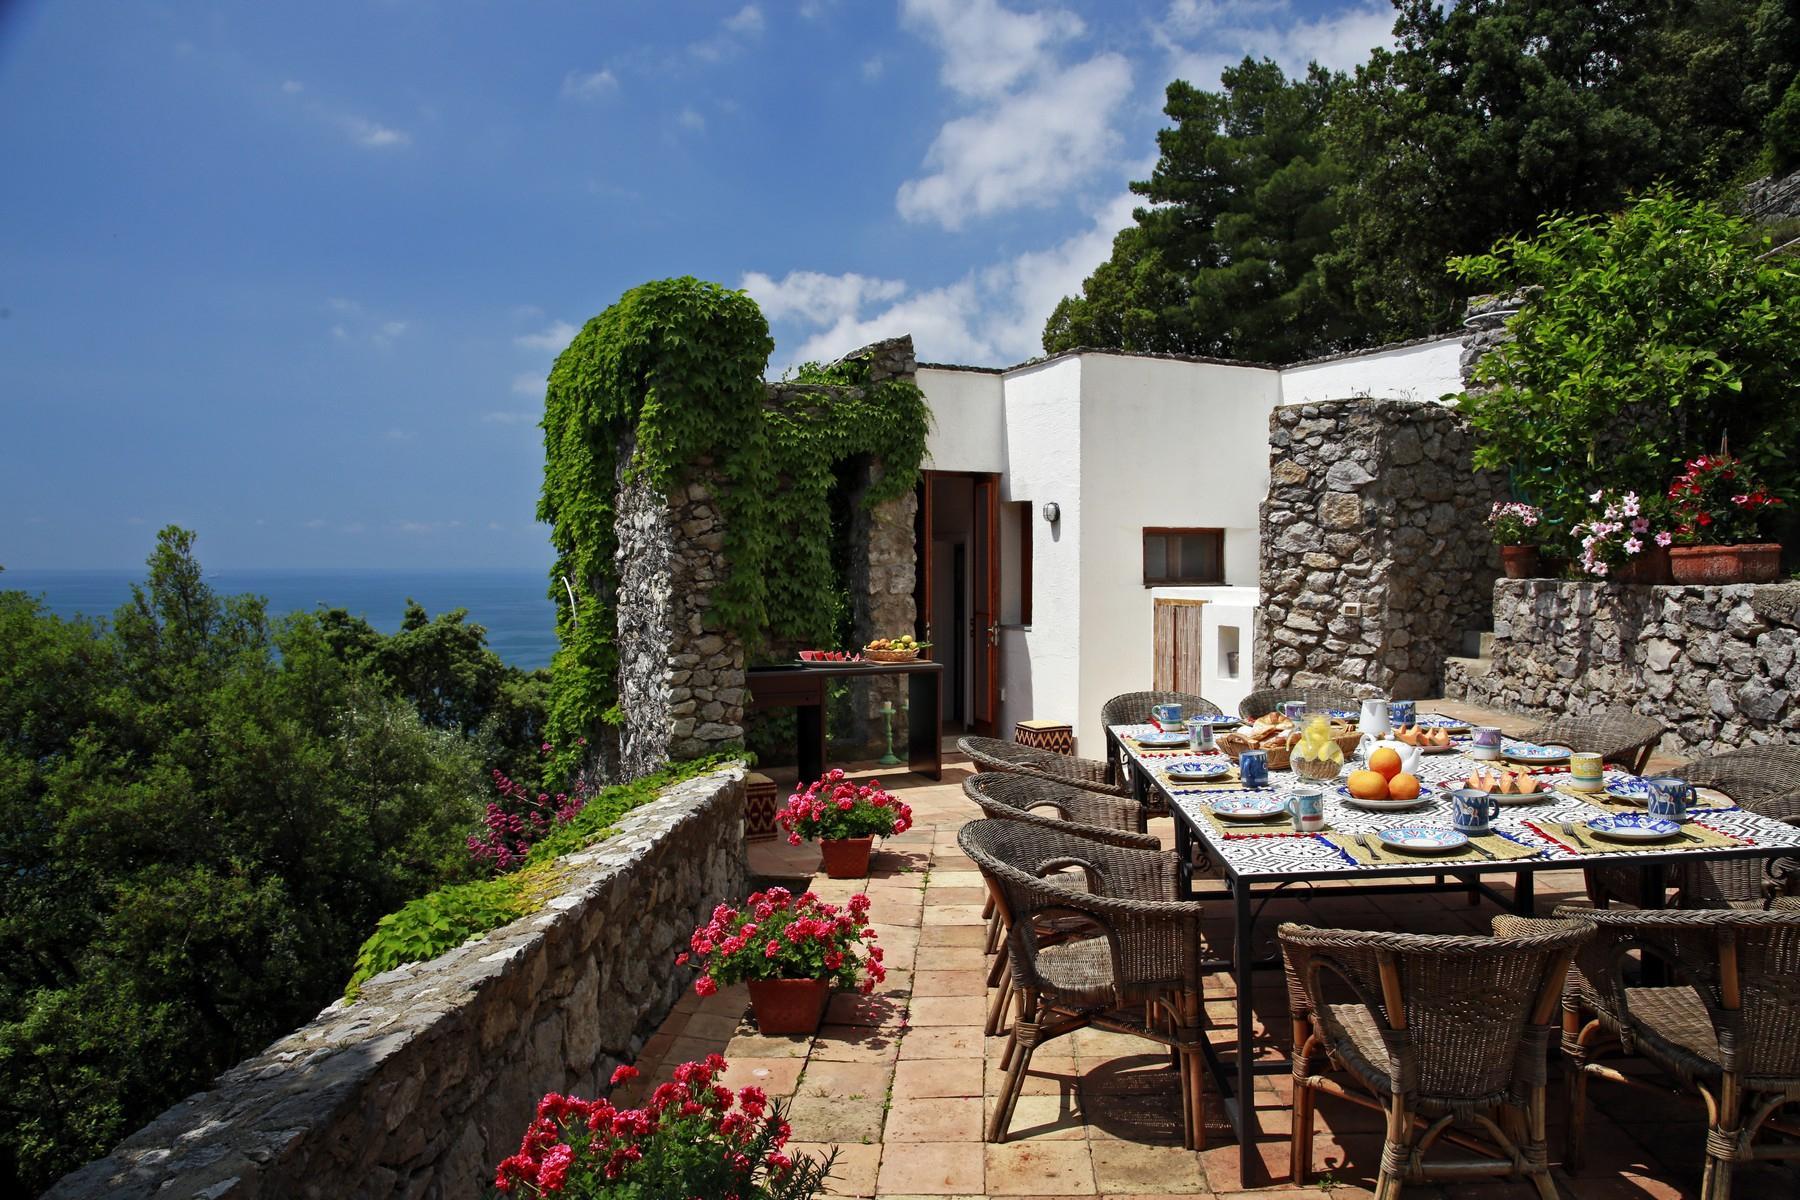 Villa pied dans l'eau in Costiera Amalfitana - 18